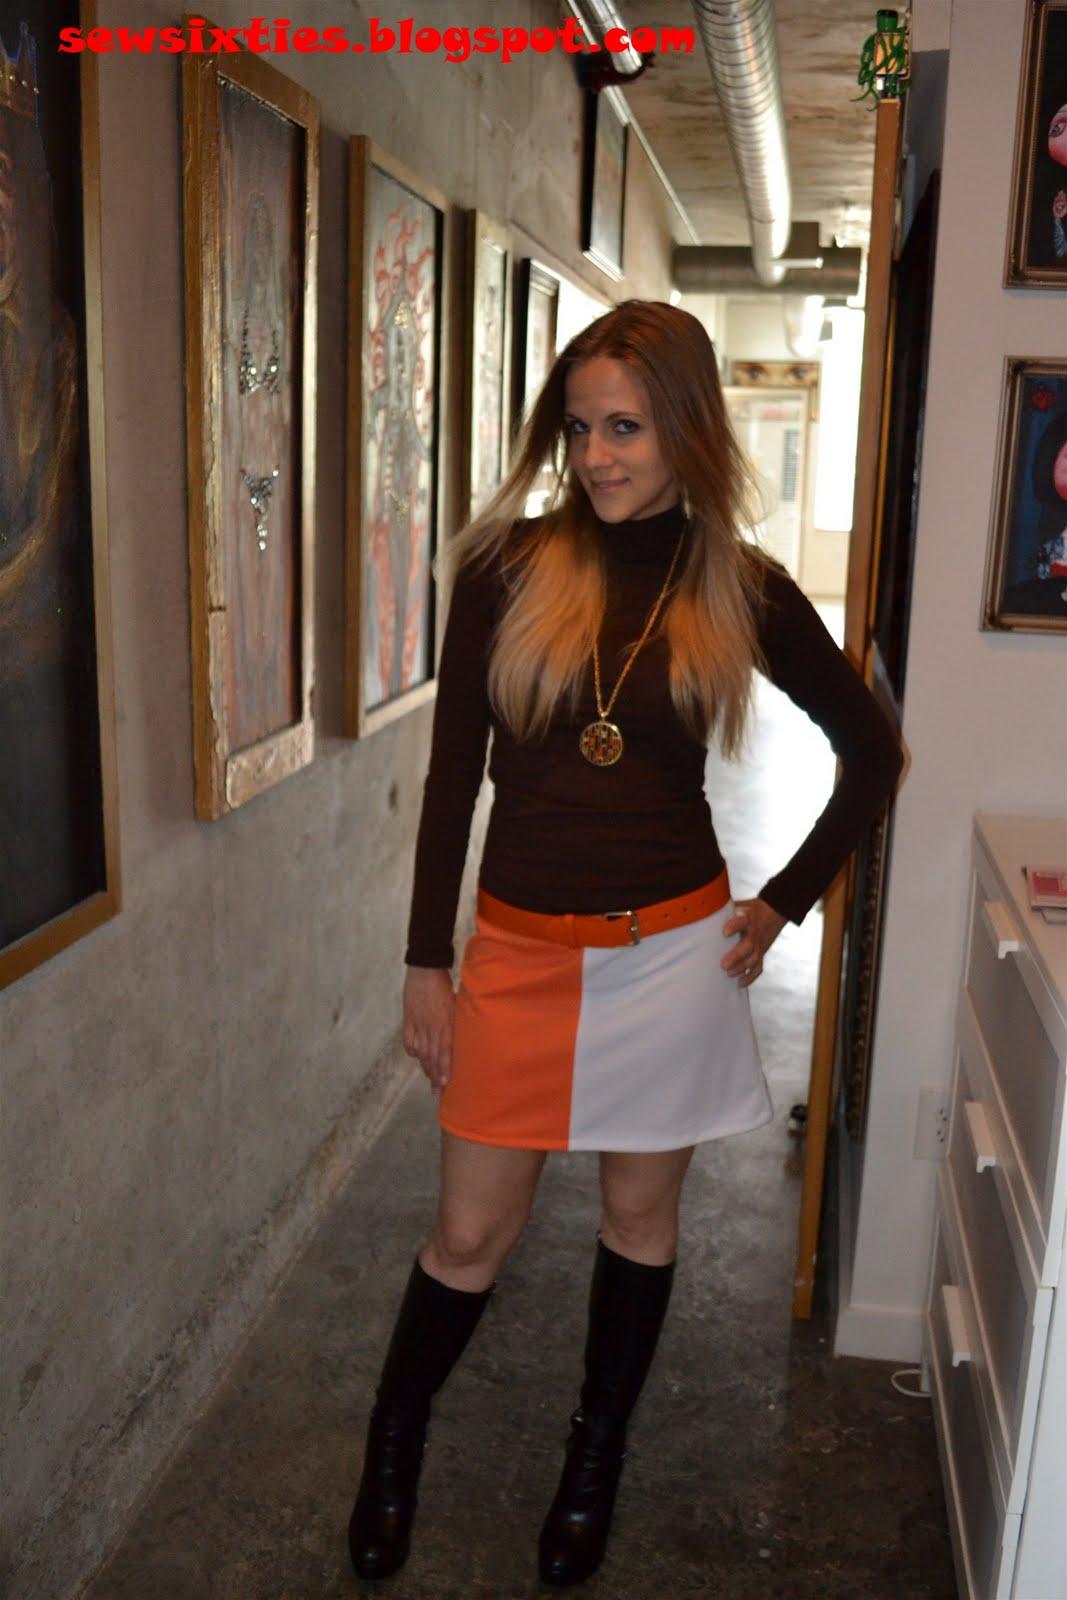 Sew Sixties Mod Mini Skirt Project Two Color Mini